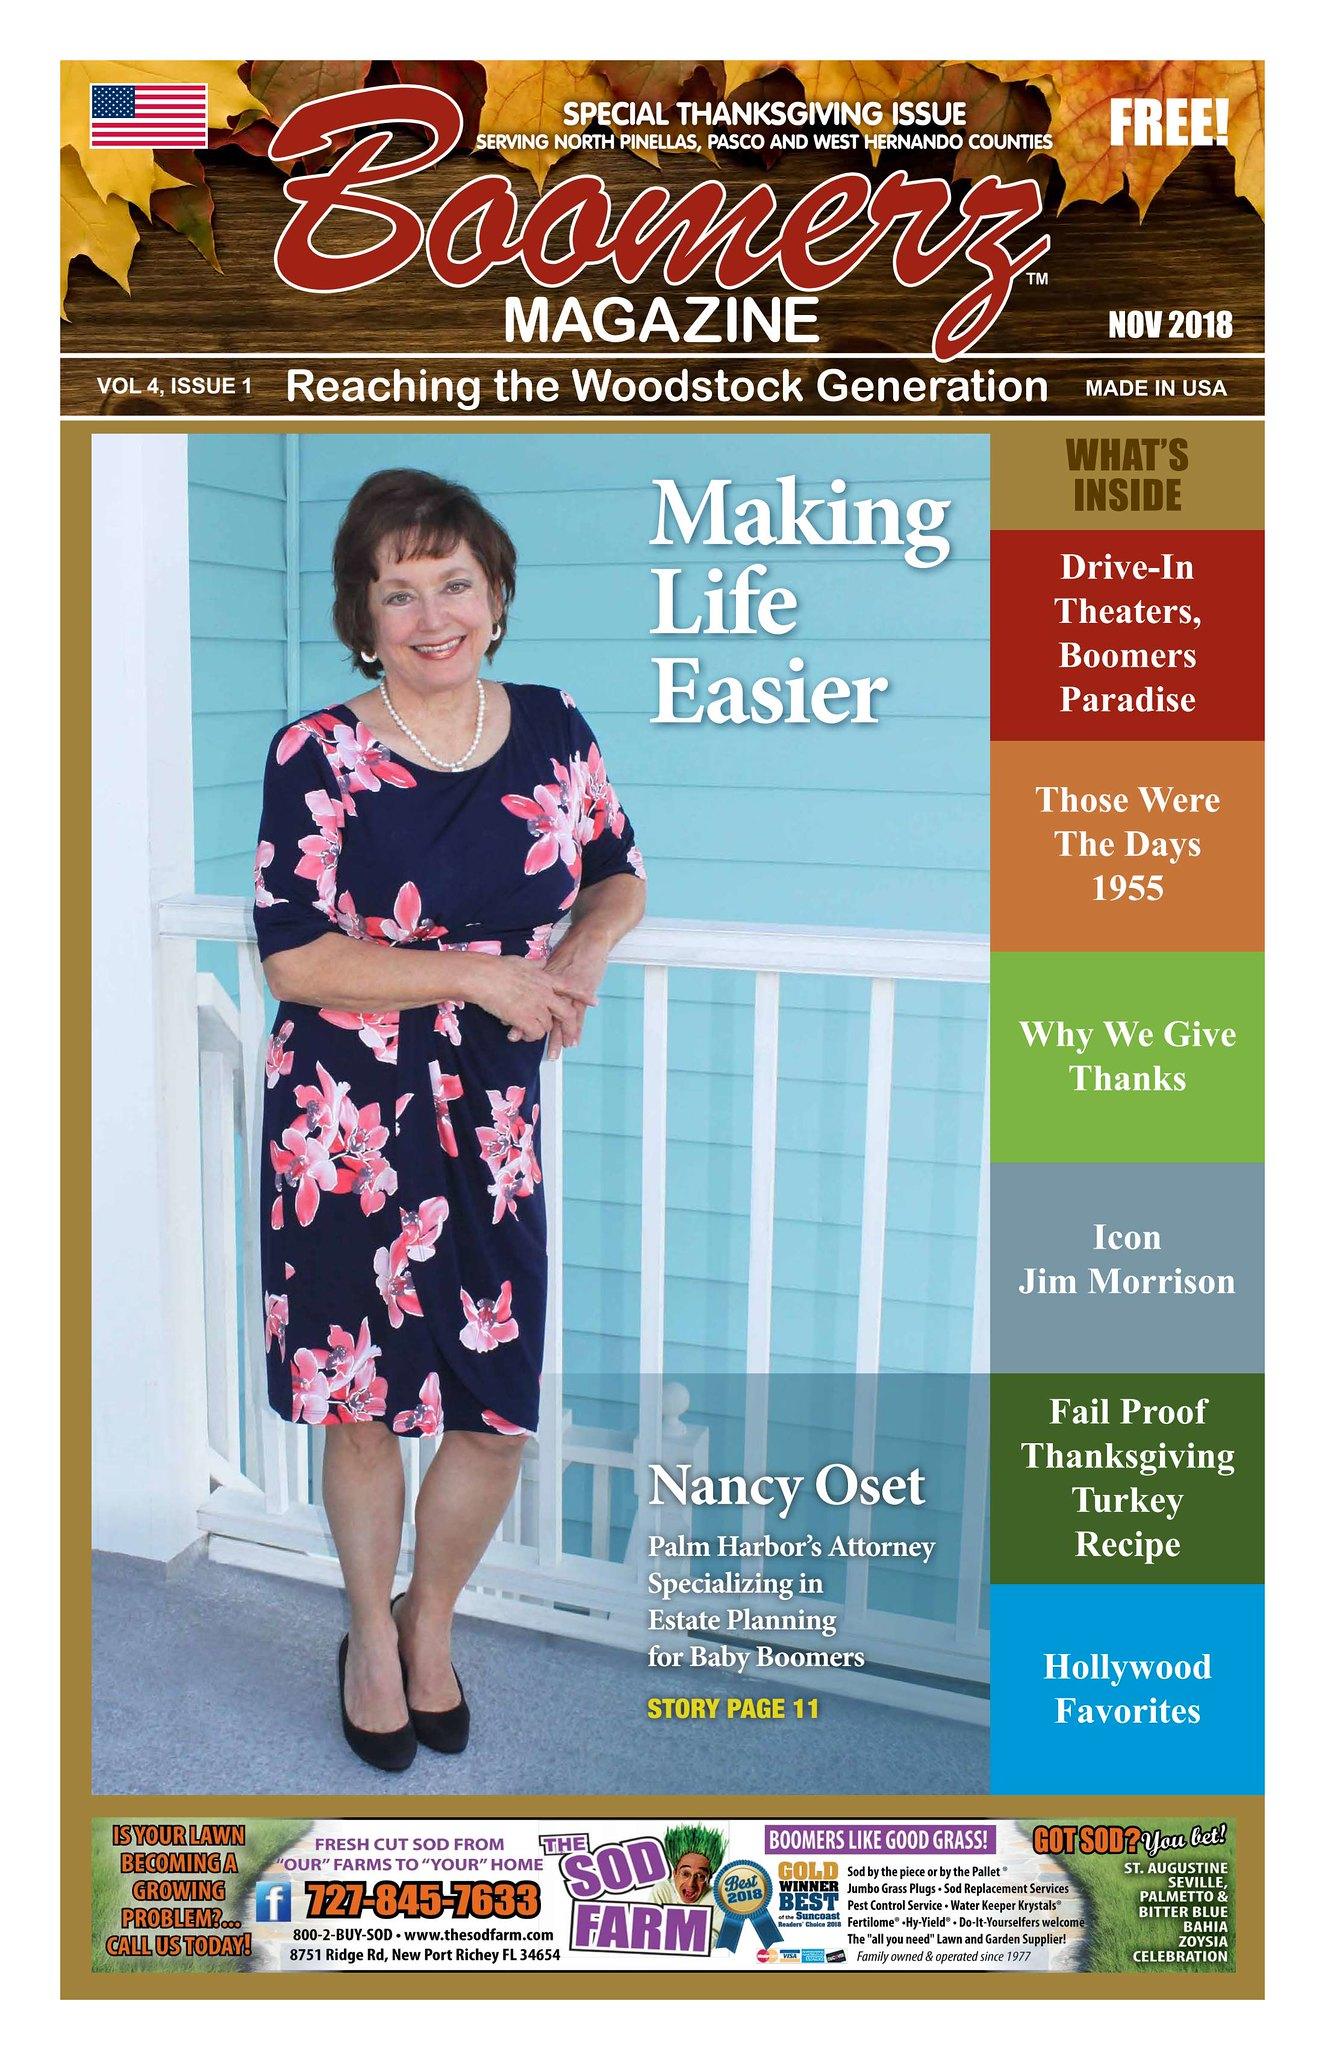 Boomerz Magazine 2018 November Cover Page